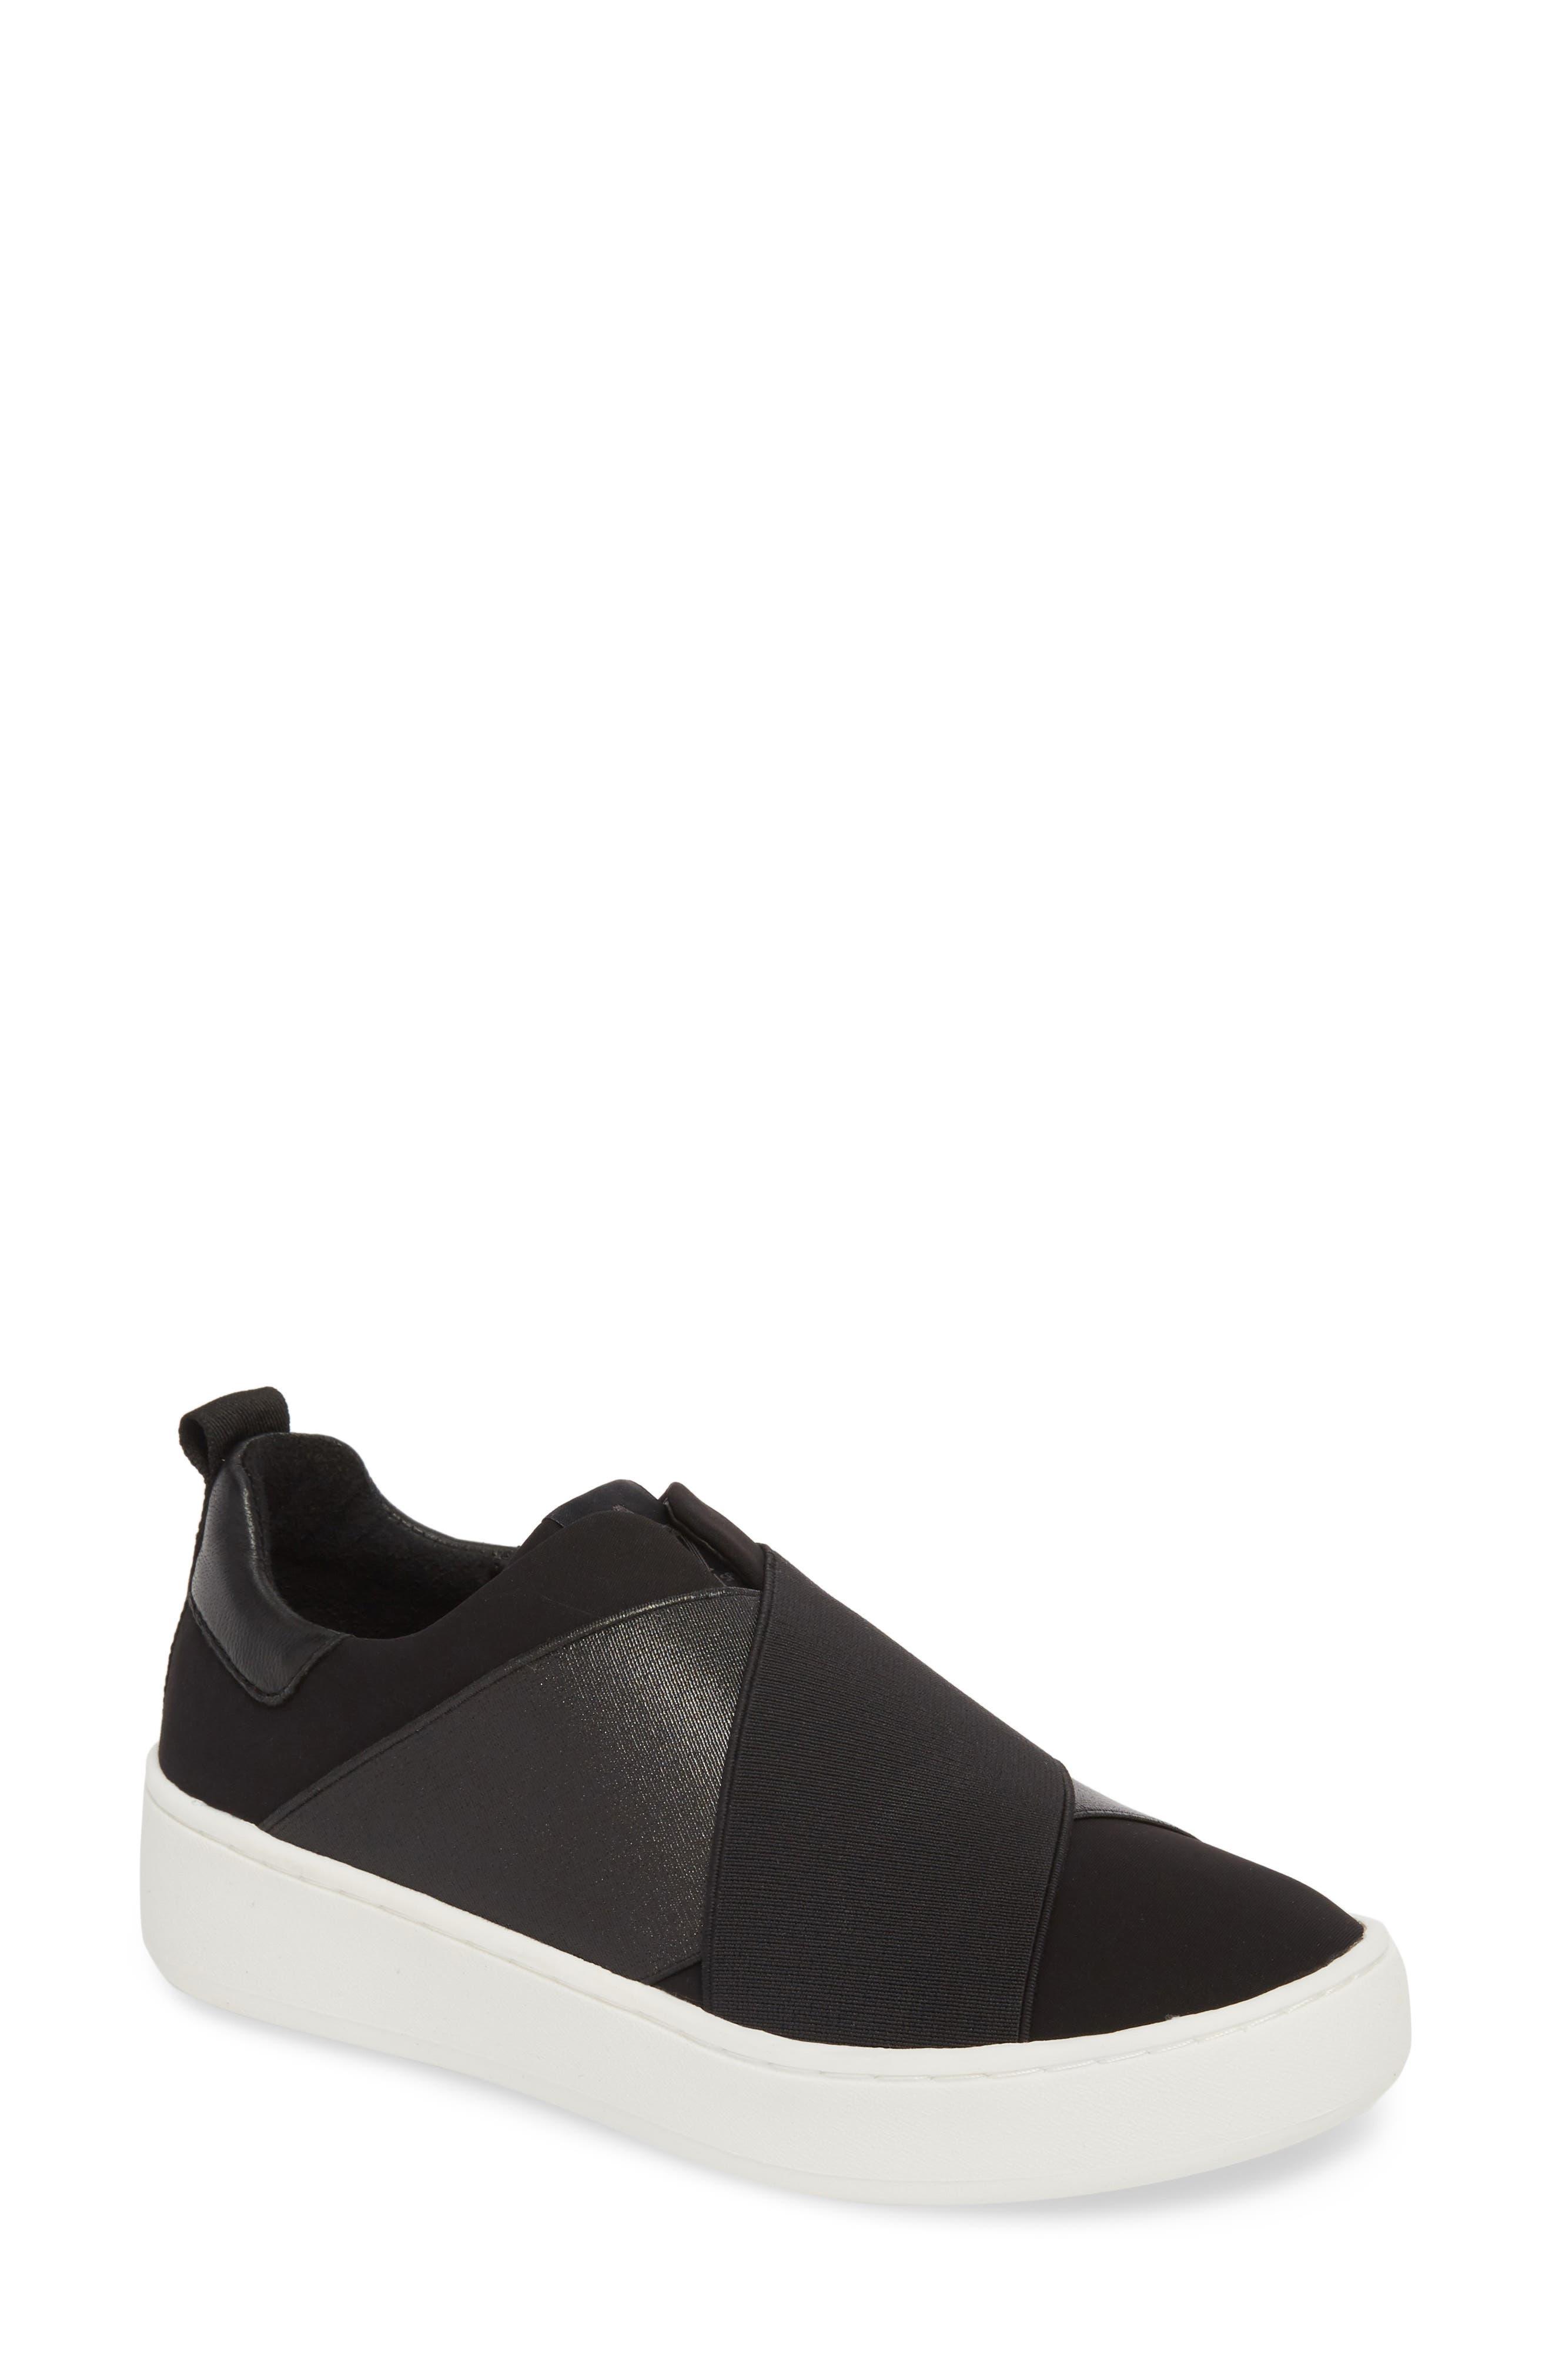 Coley Platform Slip-On Sneaker,                             Main thumbnail 1, color,                             BLACK LEATHER